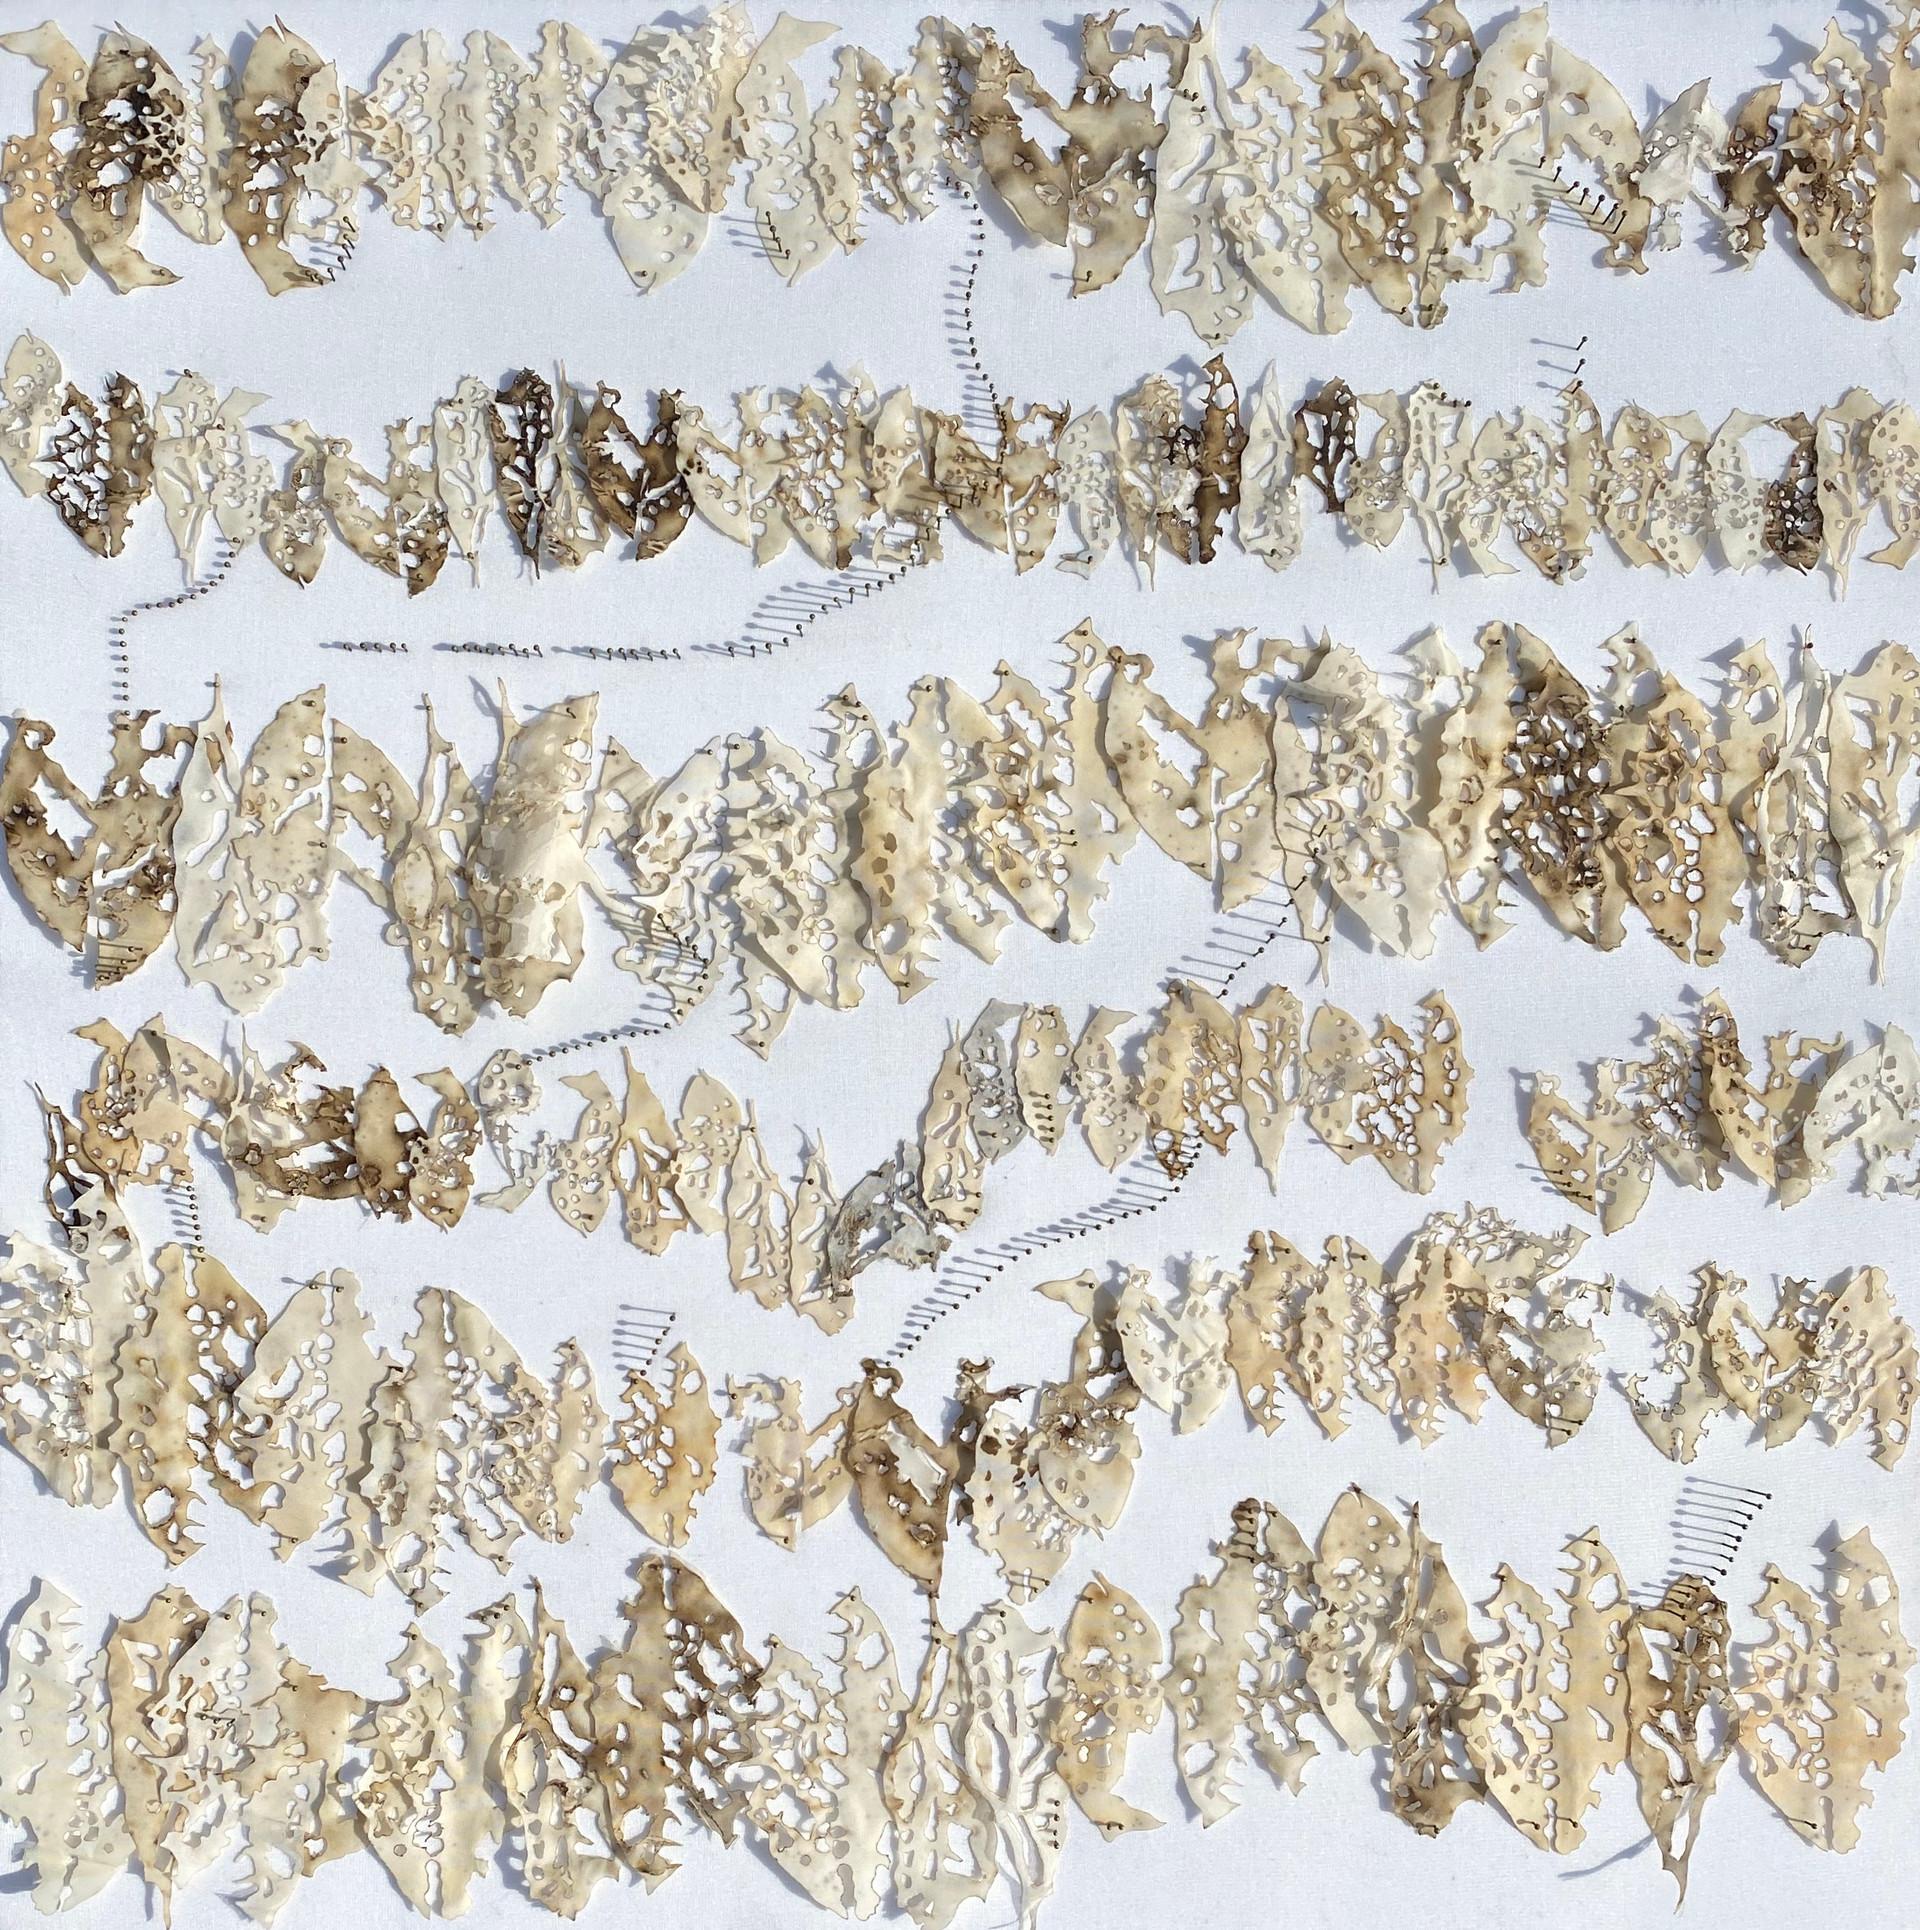 Bitten Leaves I/2020/Mixed techniques & entomological pins on linen/60x60 cm